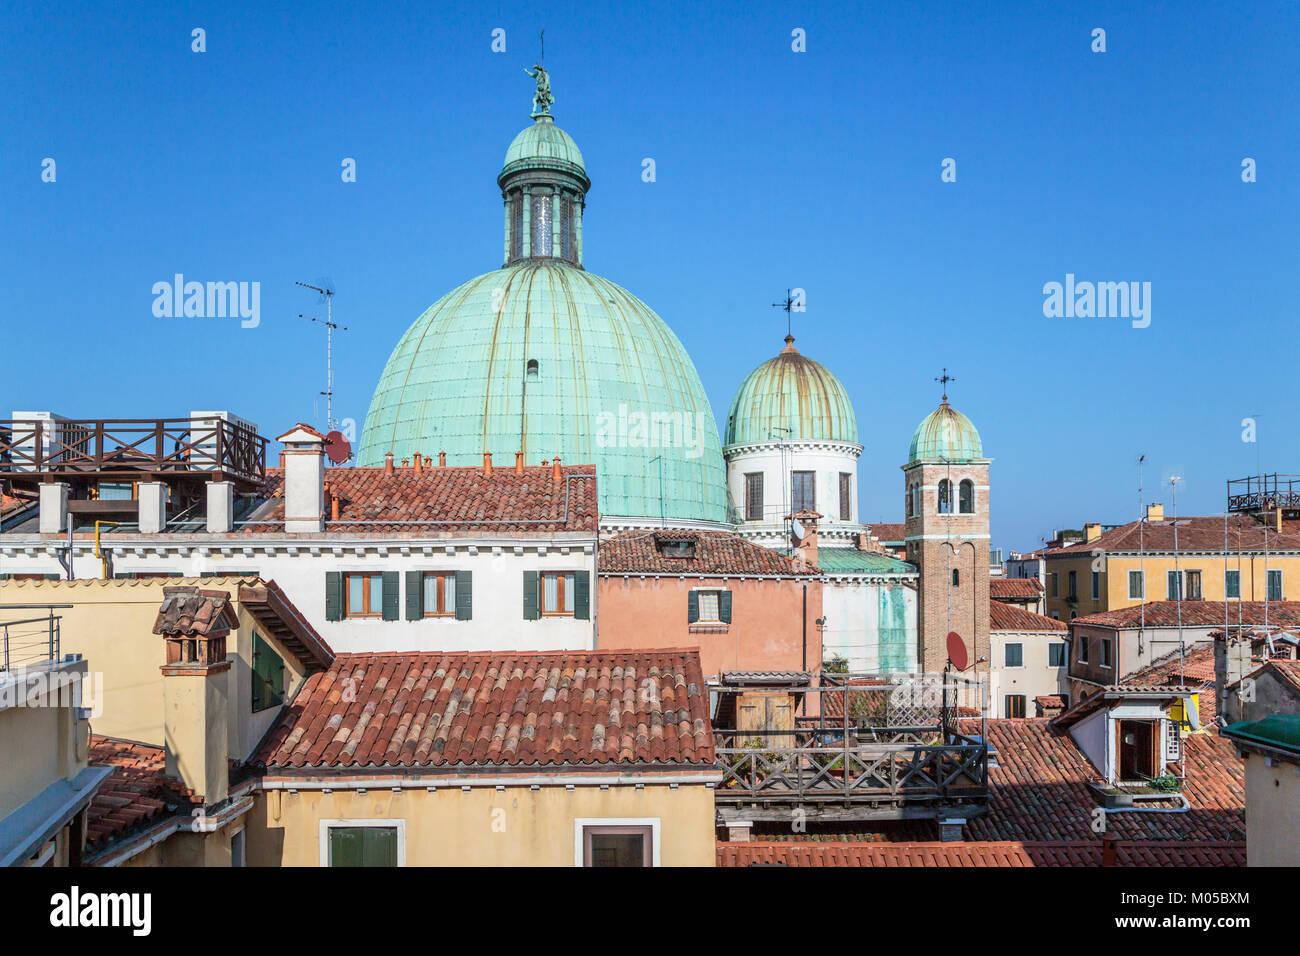 Kirche Kuppeln der Kirche San Simeone Piccolo entlang des Canal Grande in Veneto, Venedig, Italien, Europa. Stockbild